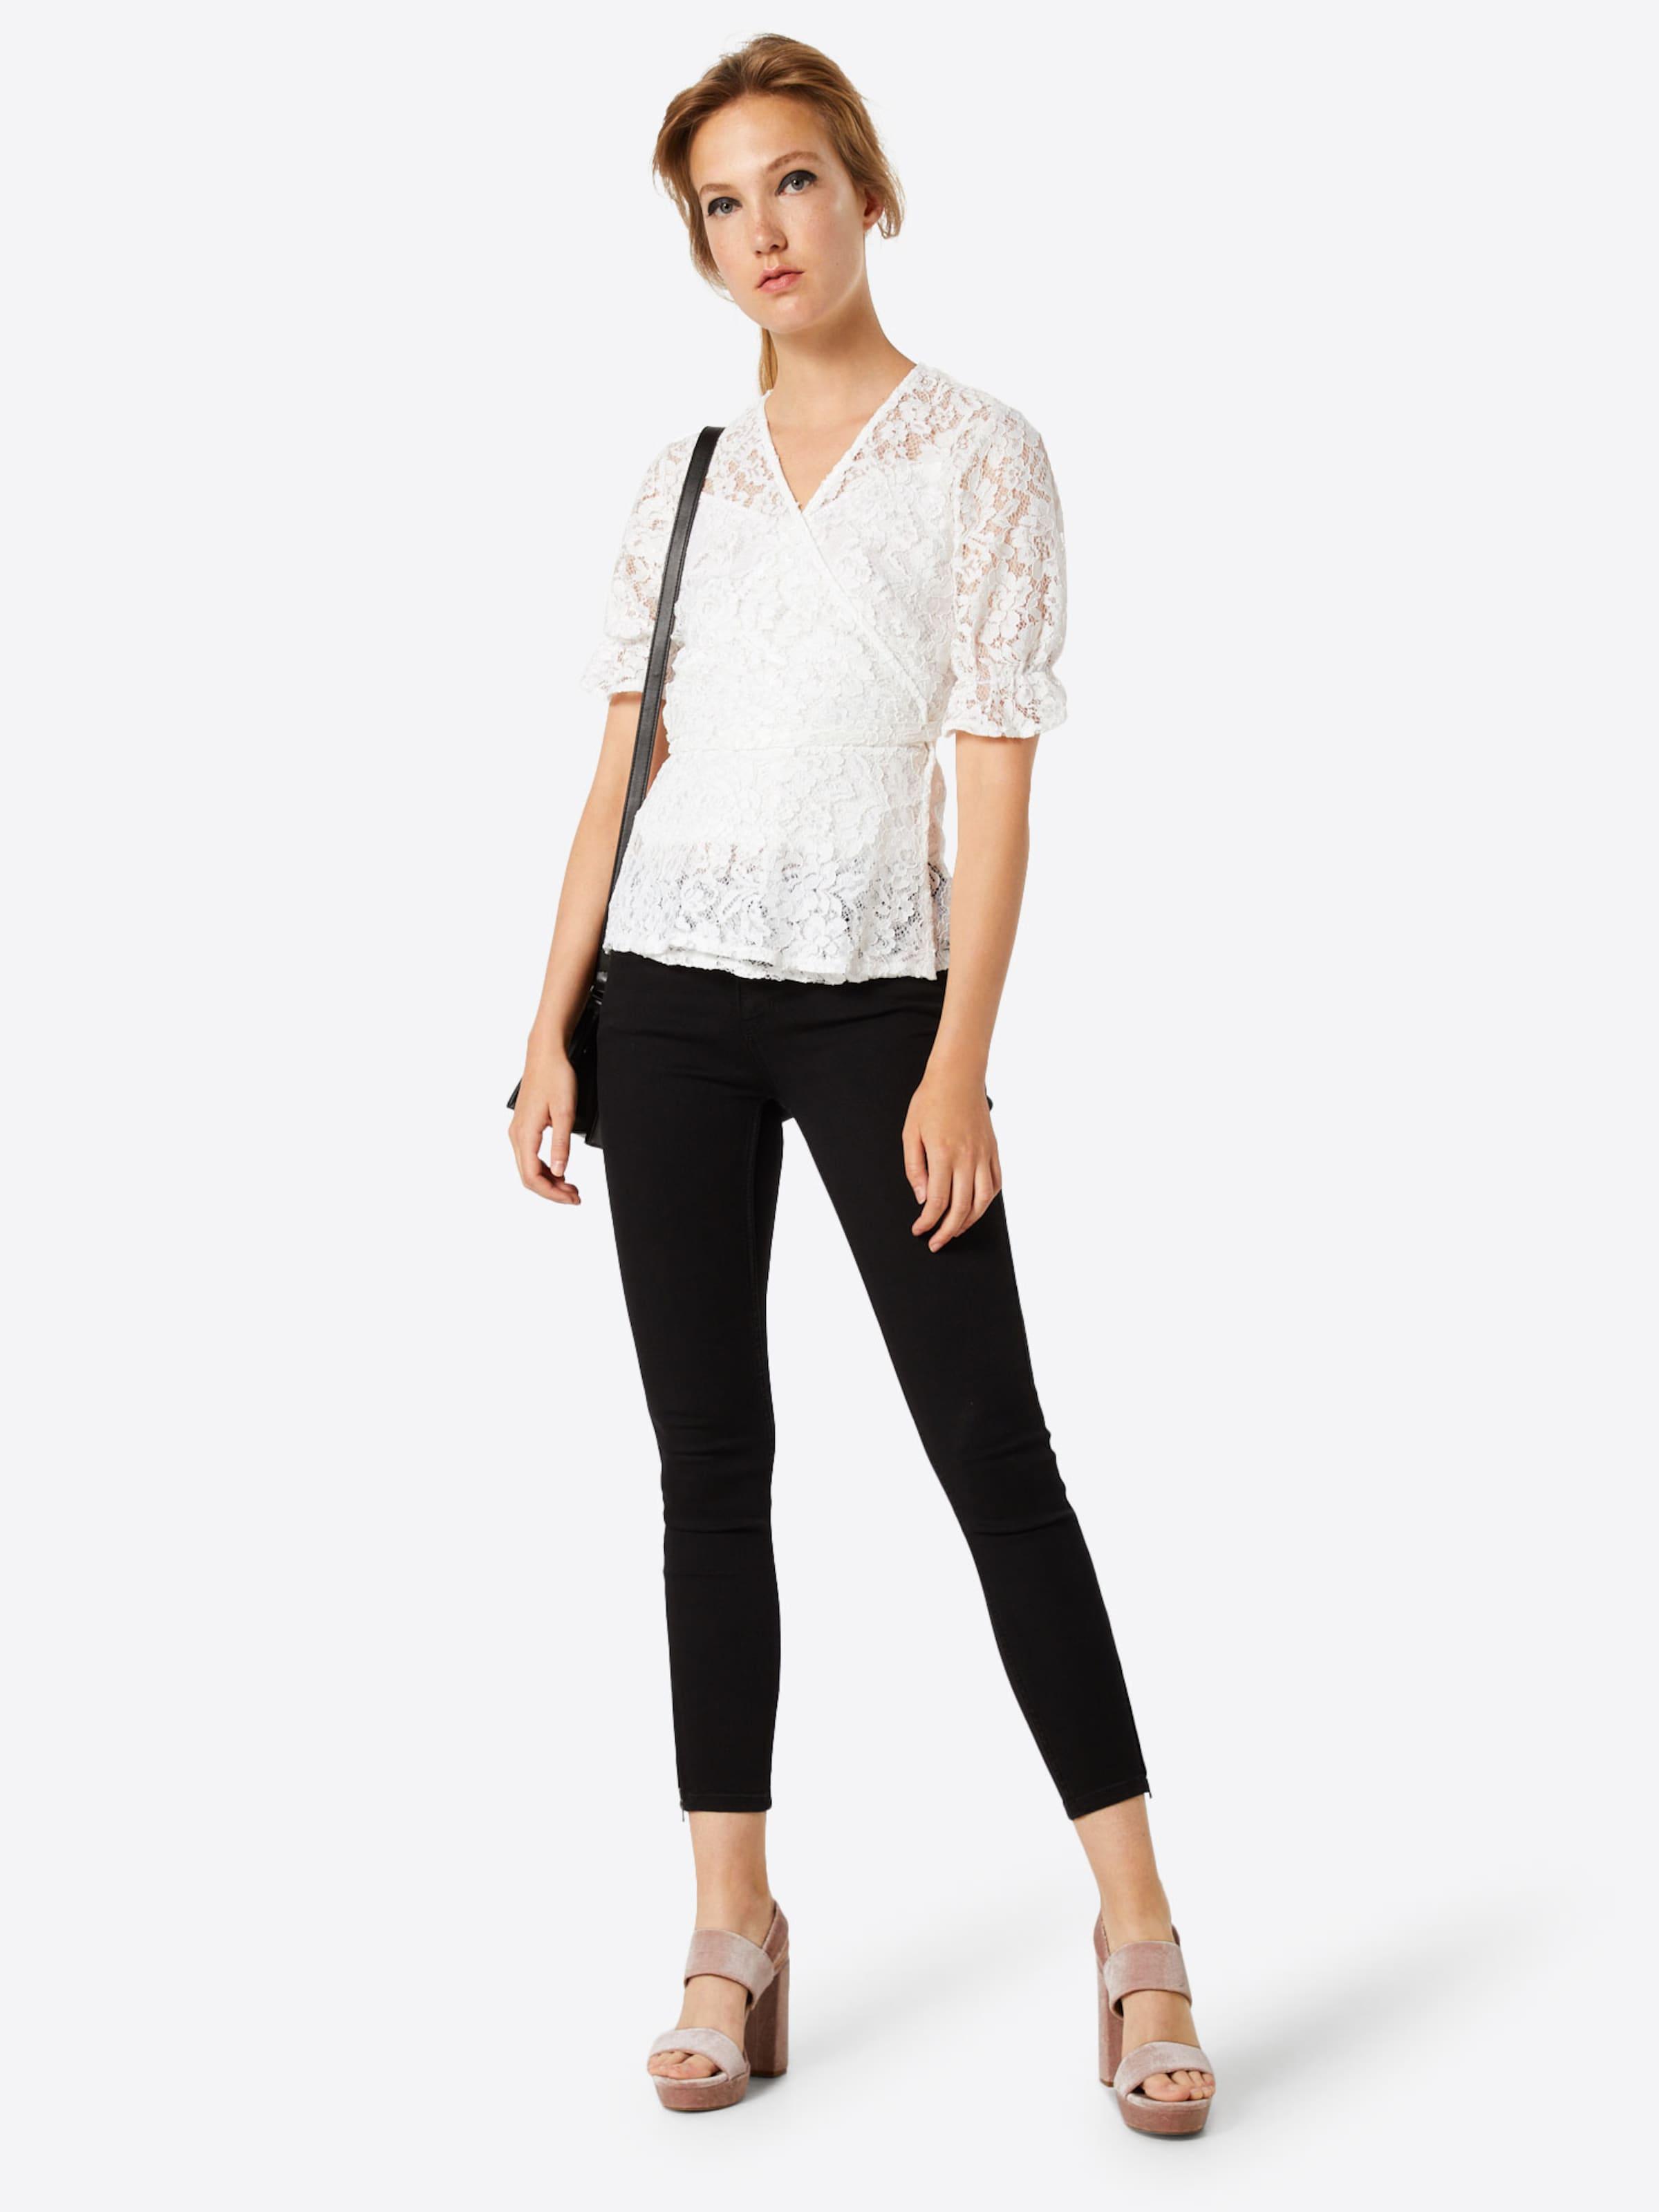 Blanc 'dione' Fashion En Union Chemisier wOZlPkXiuT